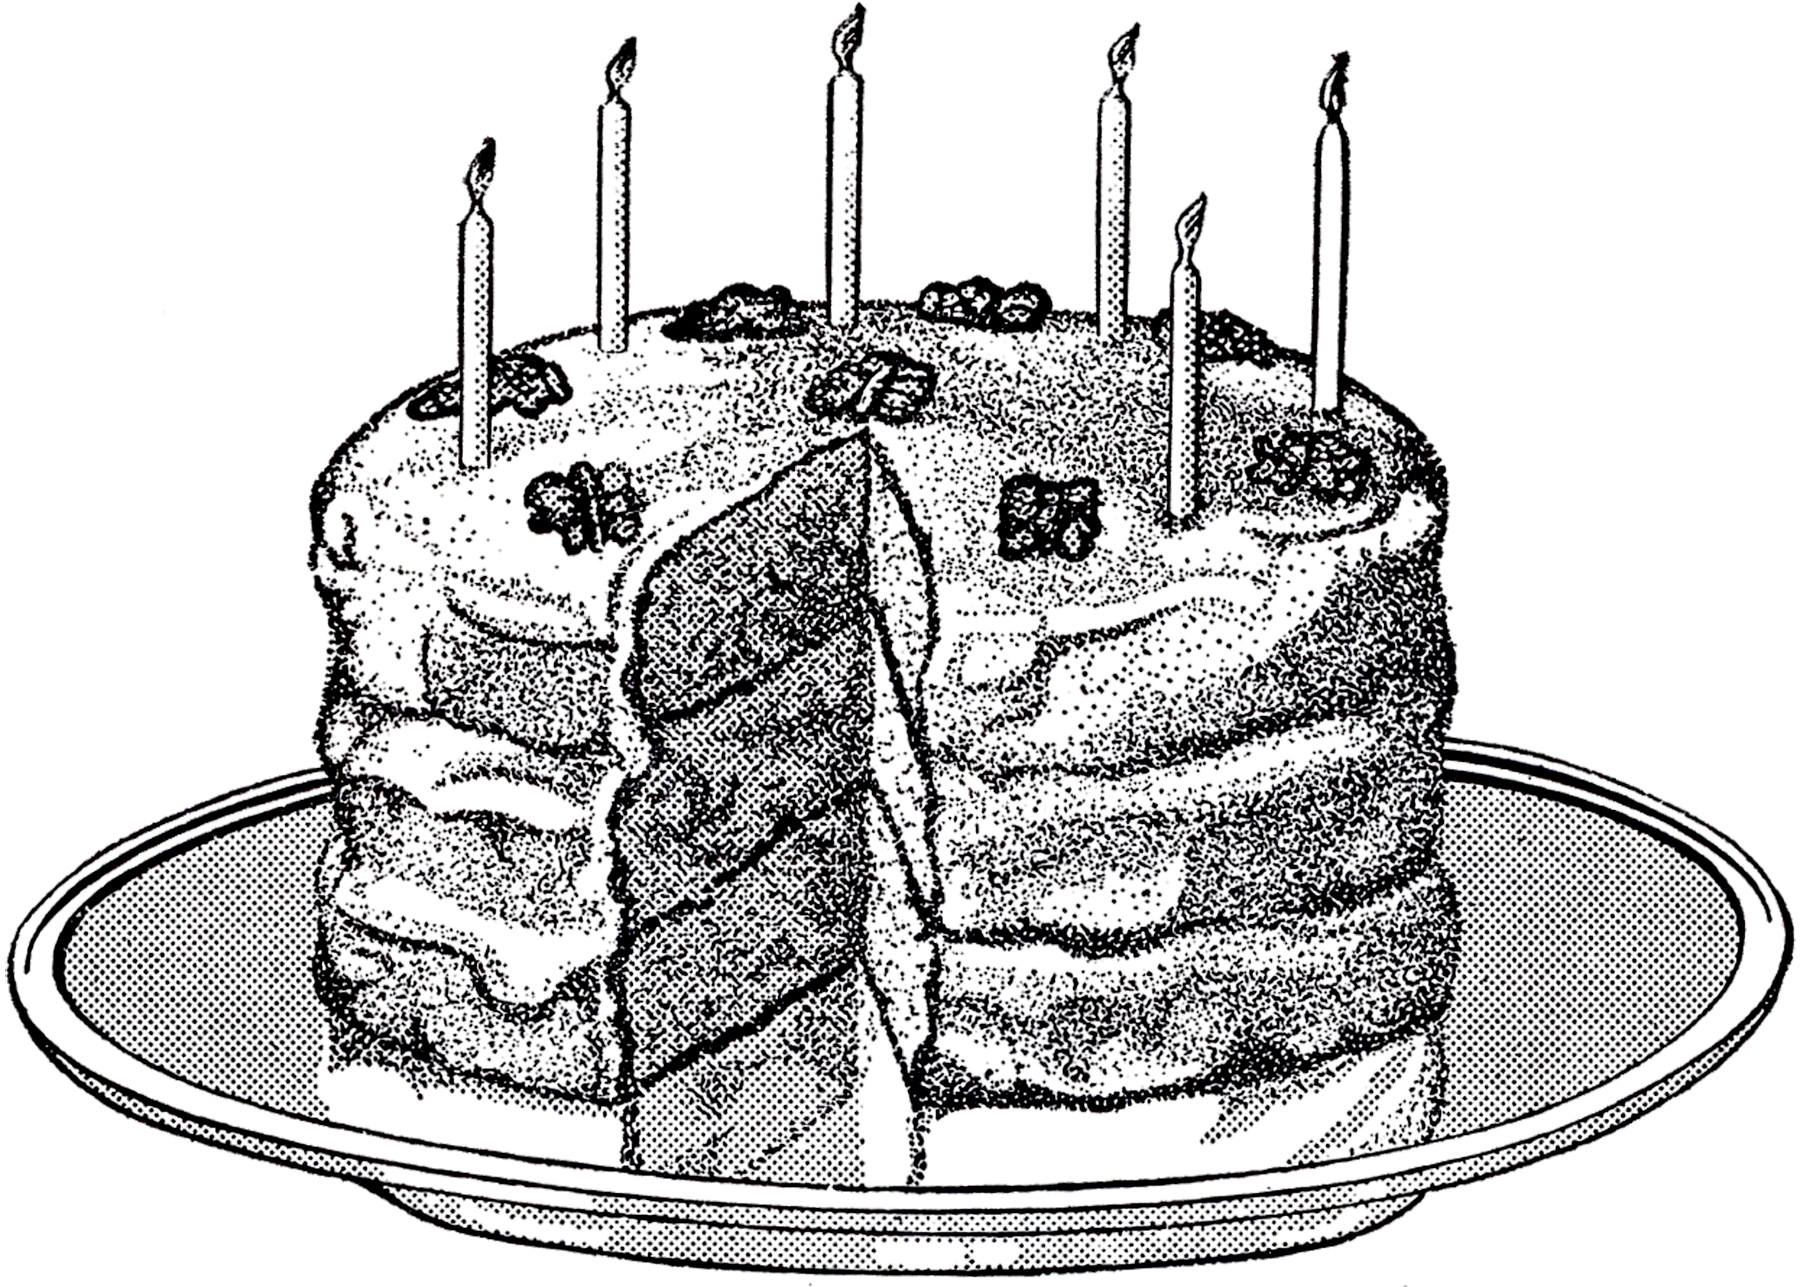 Vintage Birthday Cake Image The Graphics Fairy